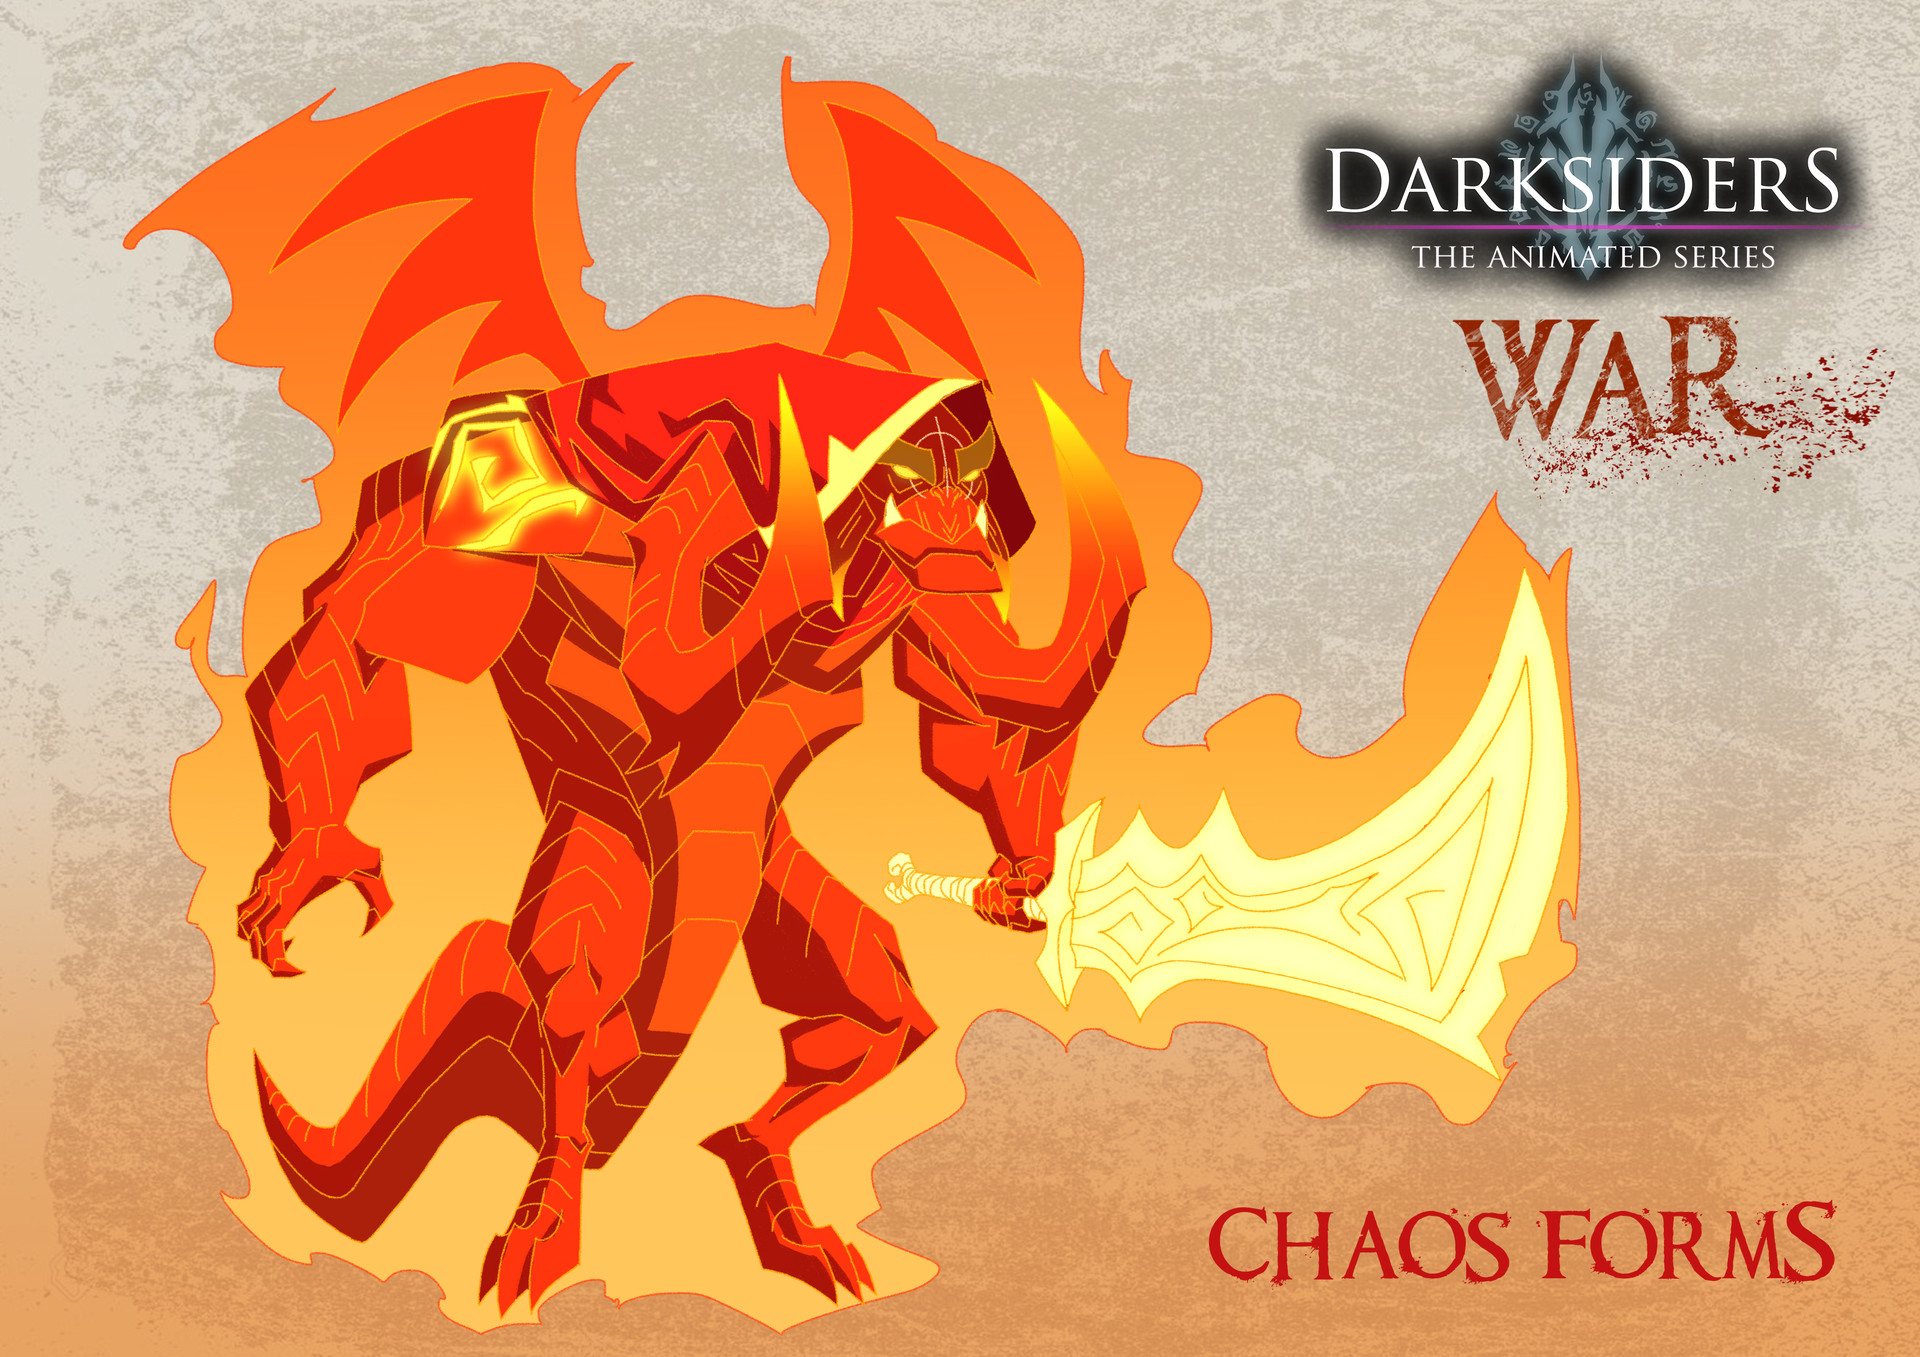 ArtStation - Darksiders War Chaos Form, Timothy De Guzman